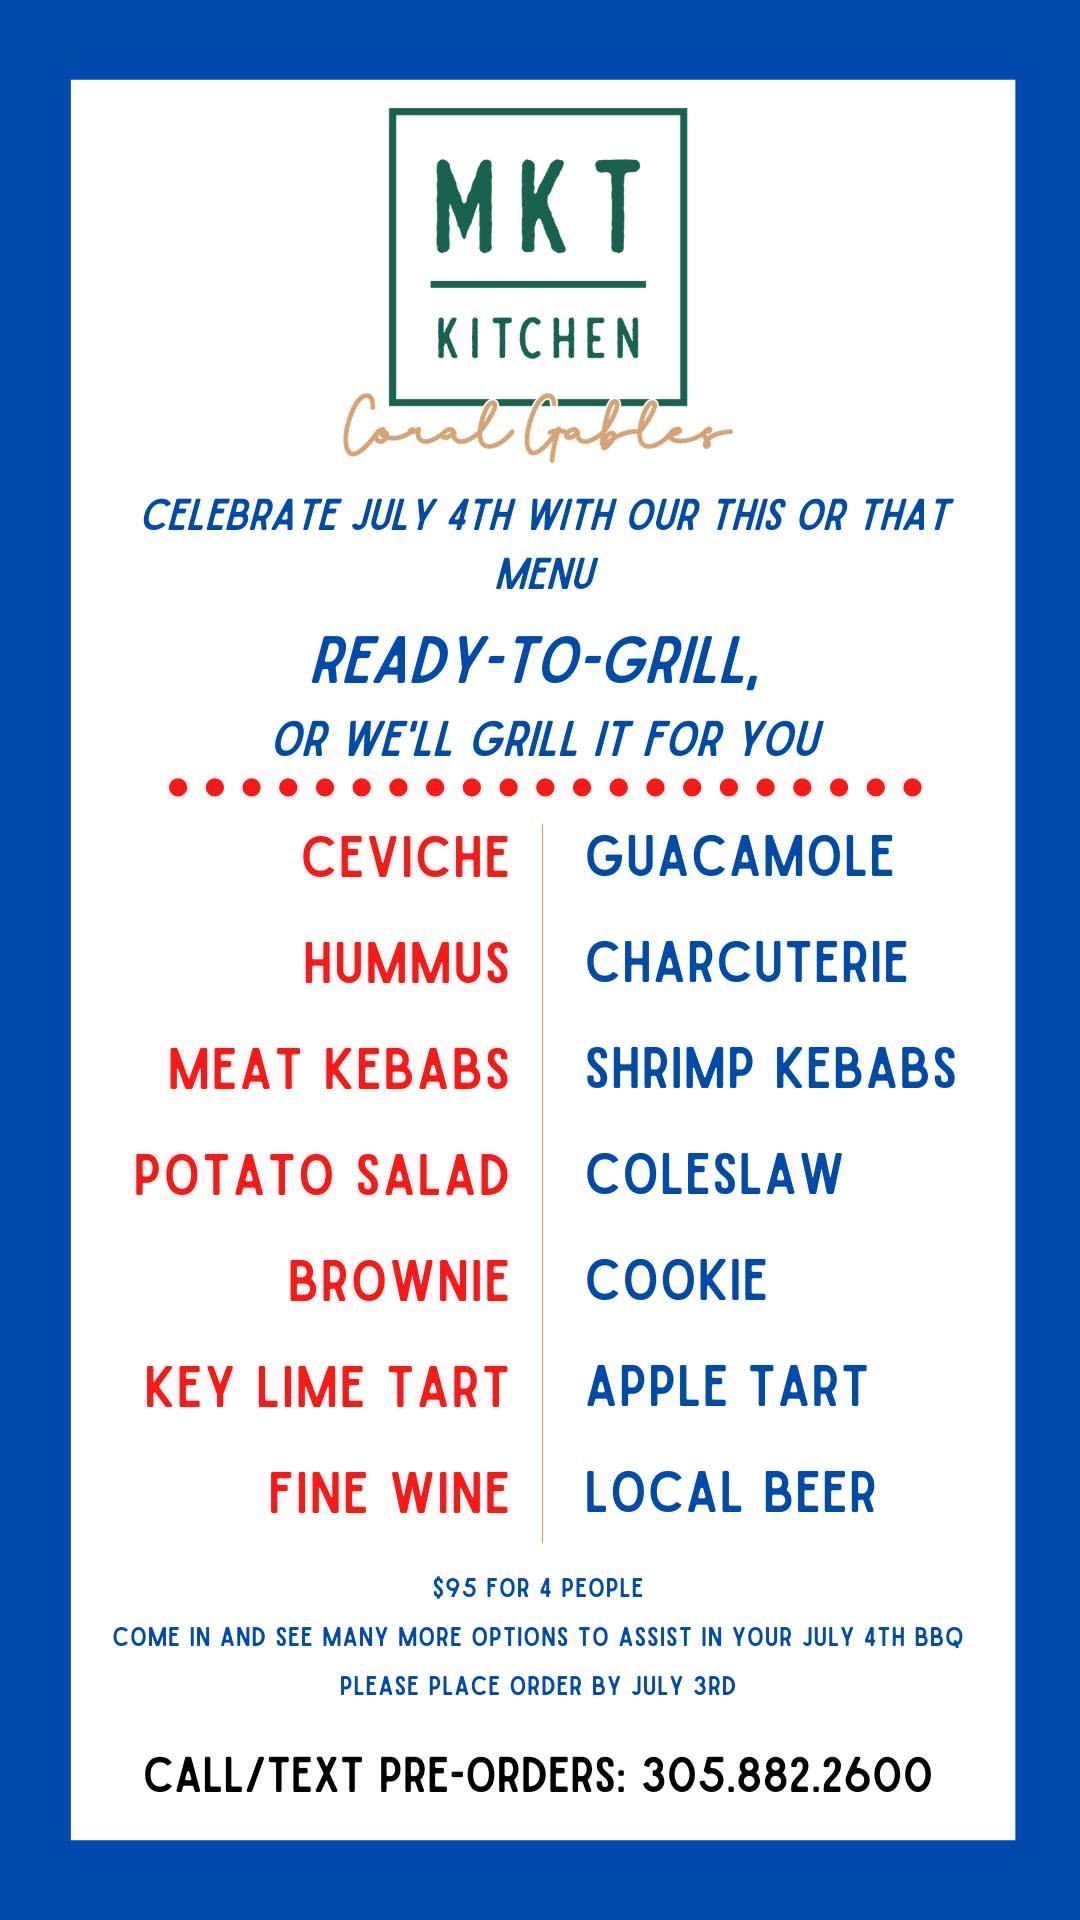 MKT Kitchen Coral Gables restaurant 4th of july menu